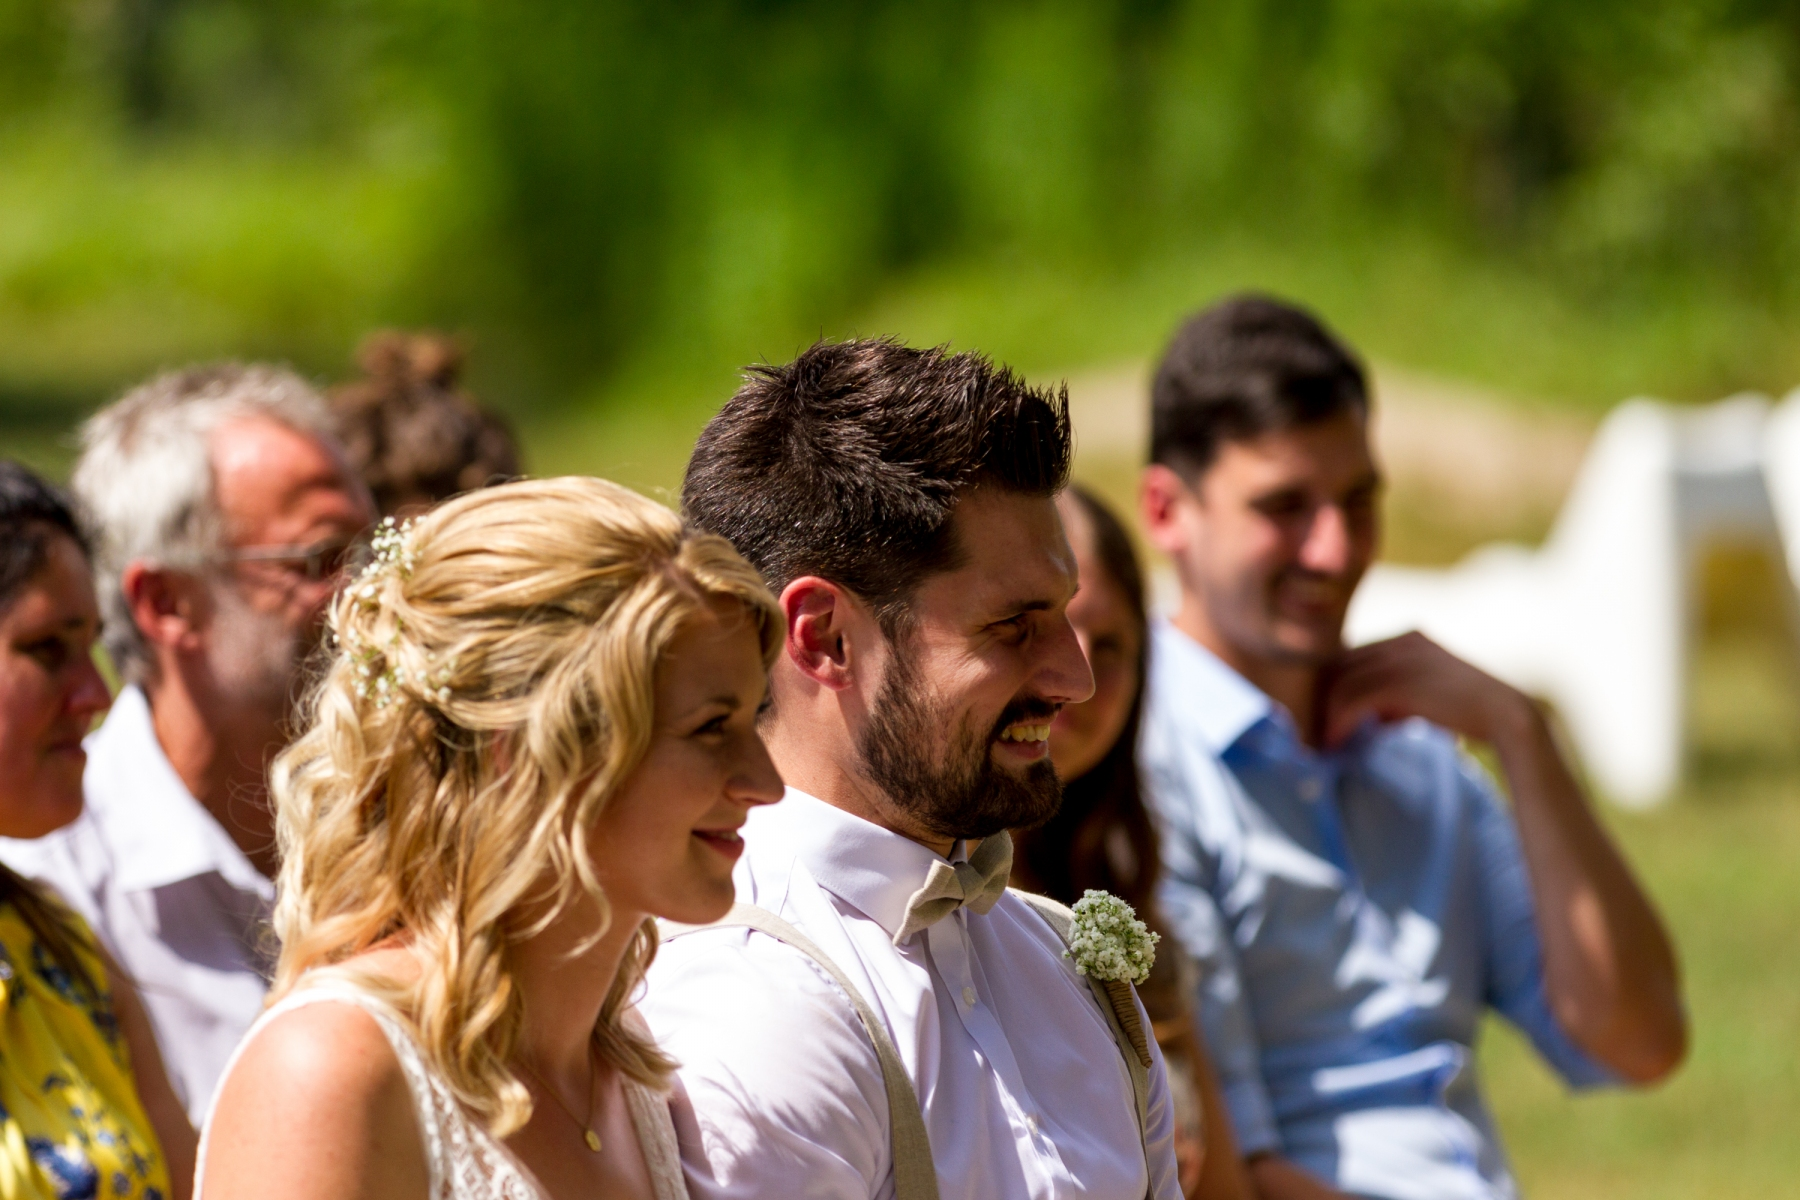 Celina und Jens heiraten in Karlsruhe